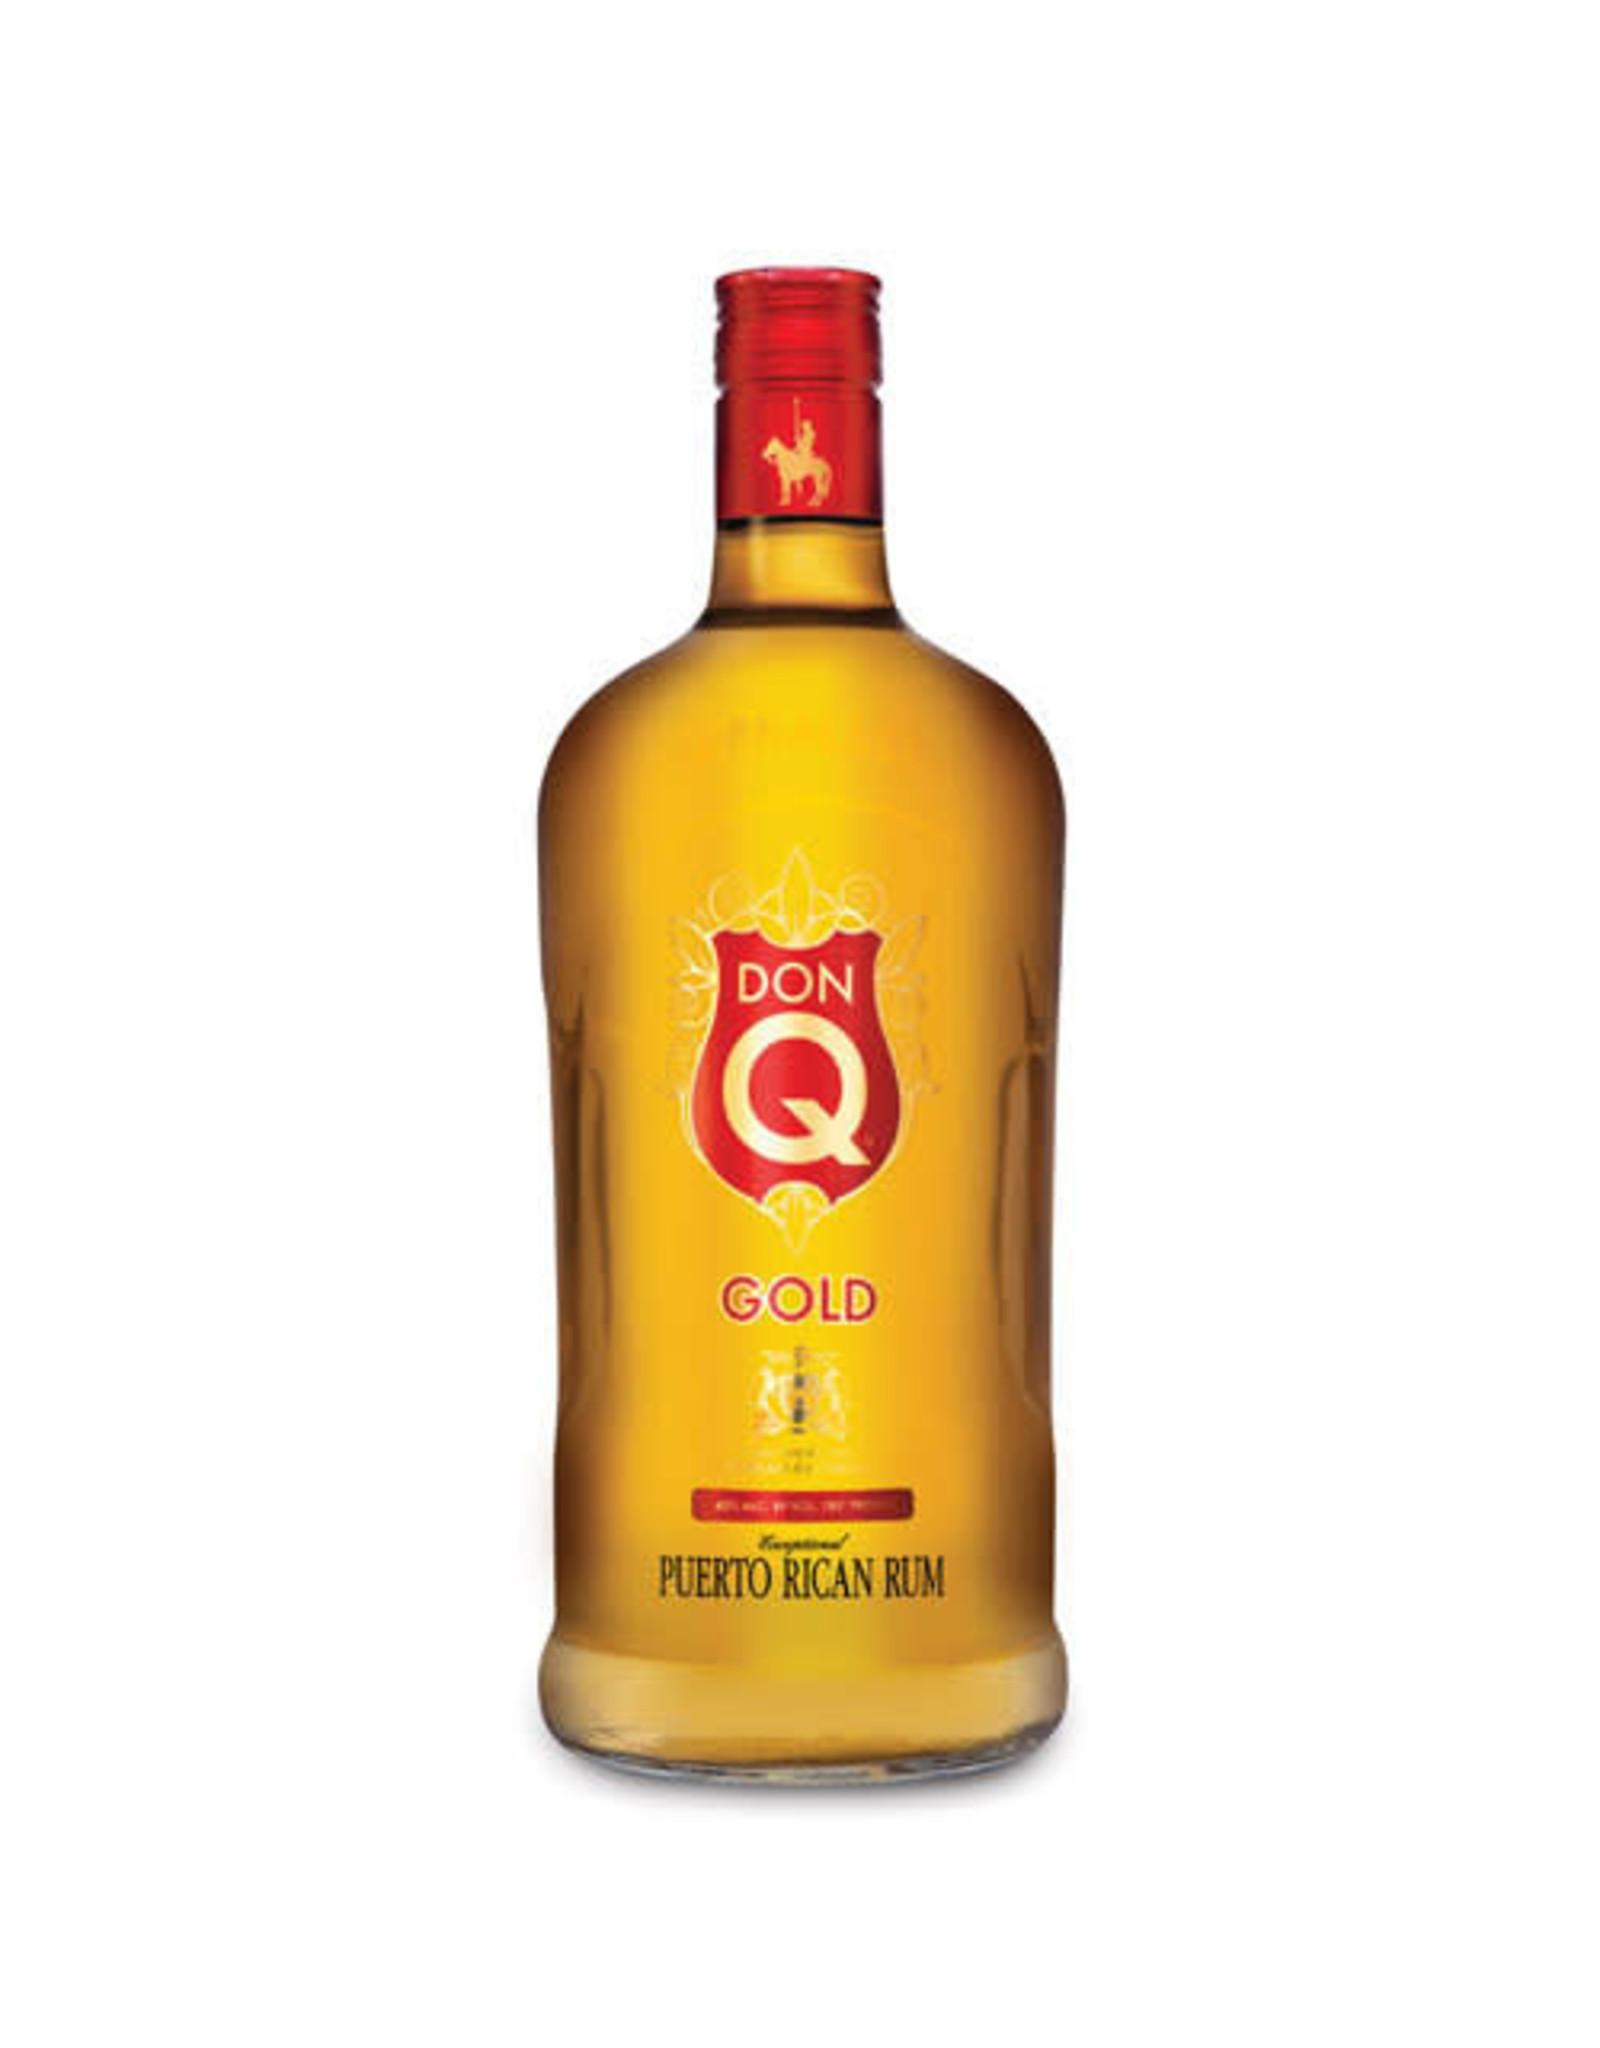 DON Q GOLD RUM 1.75L